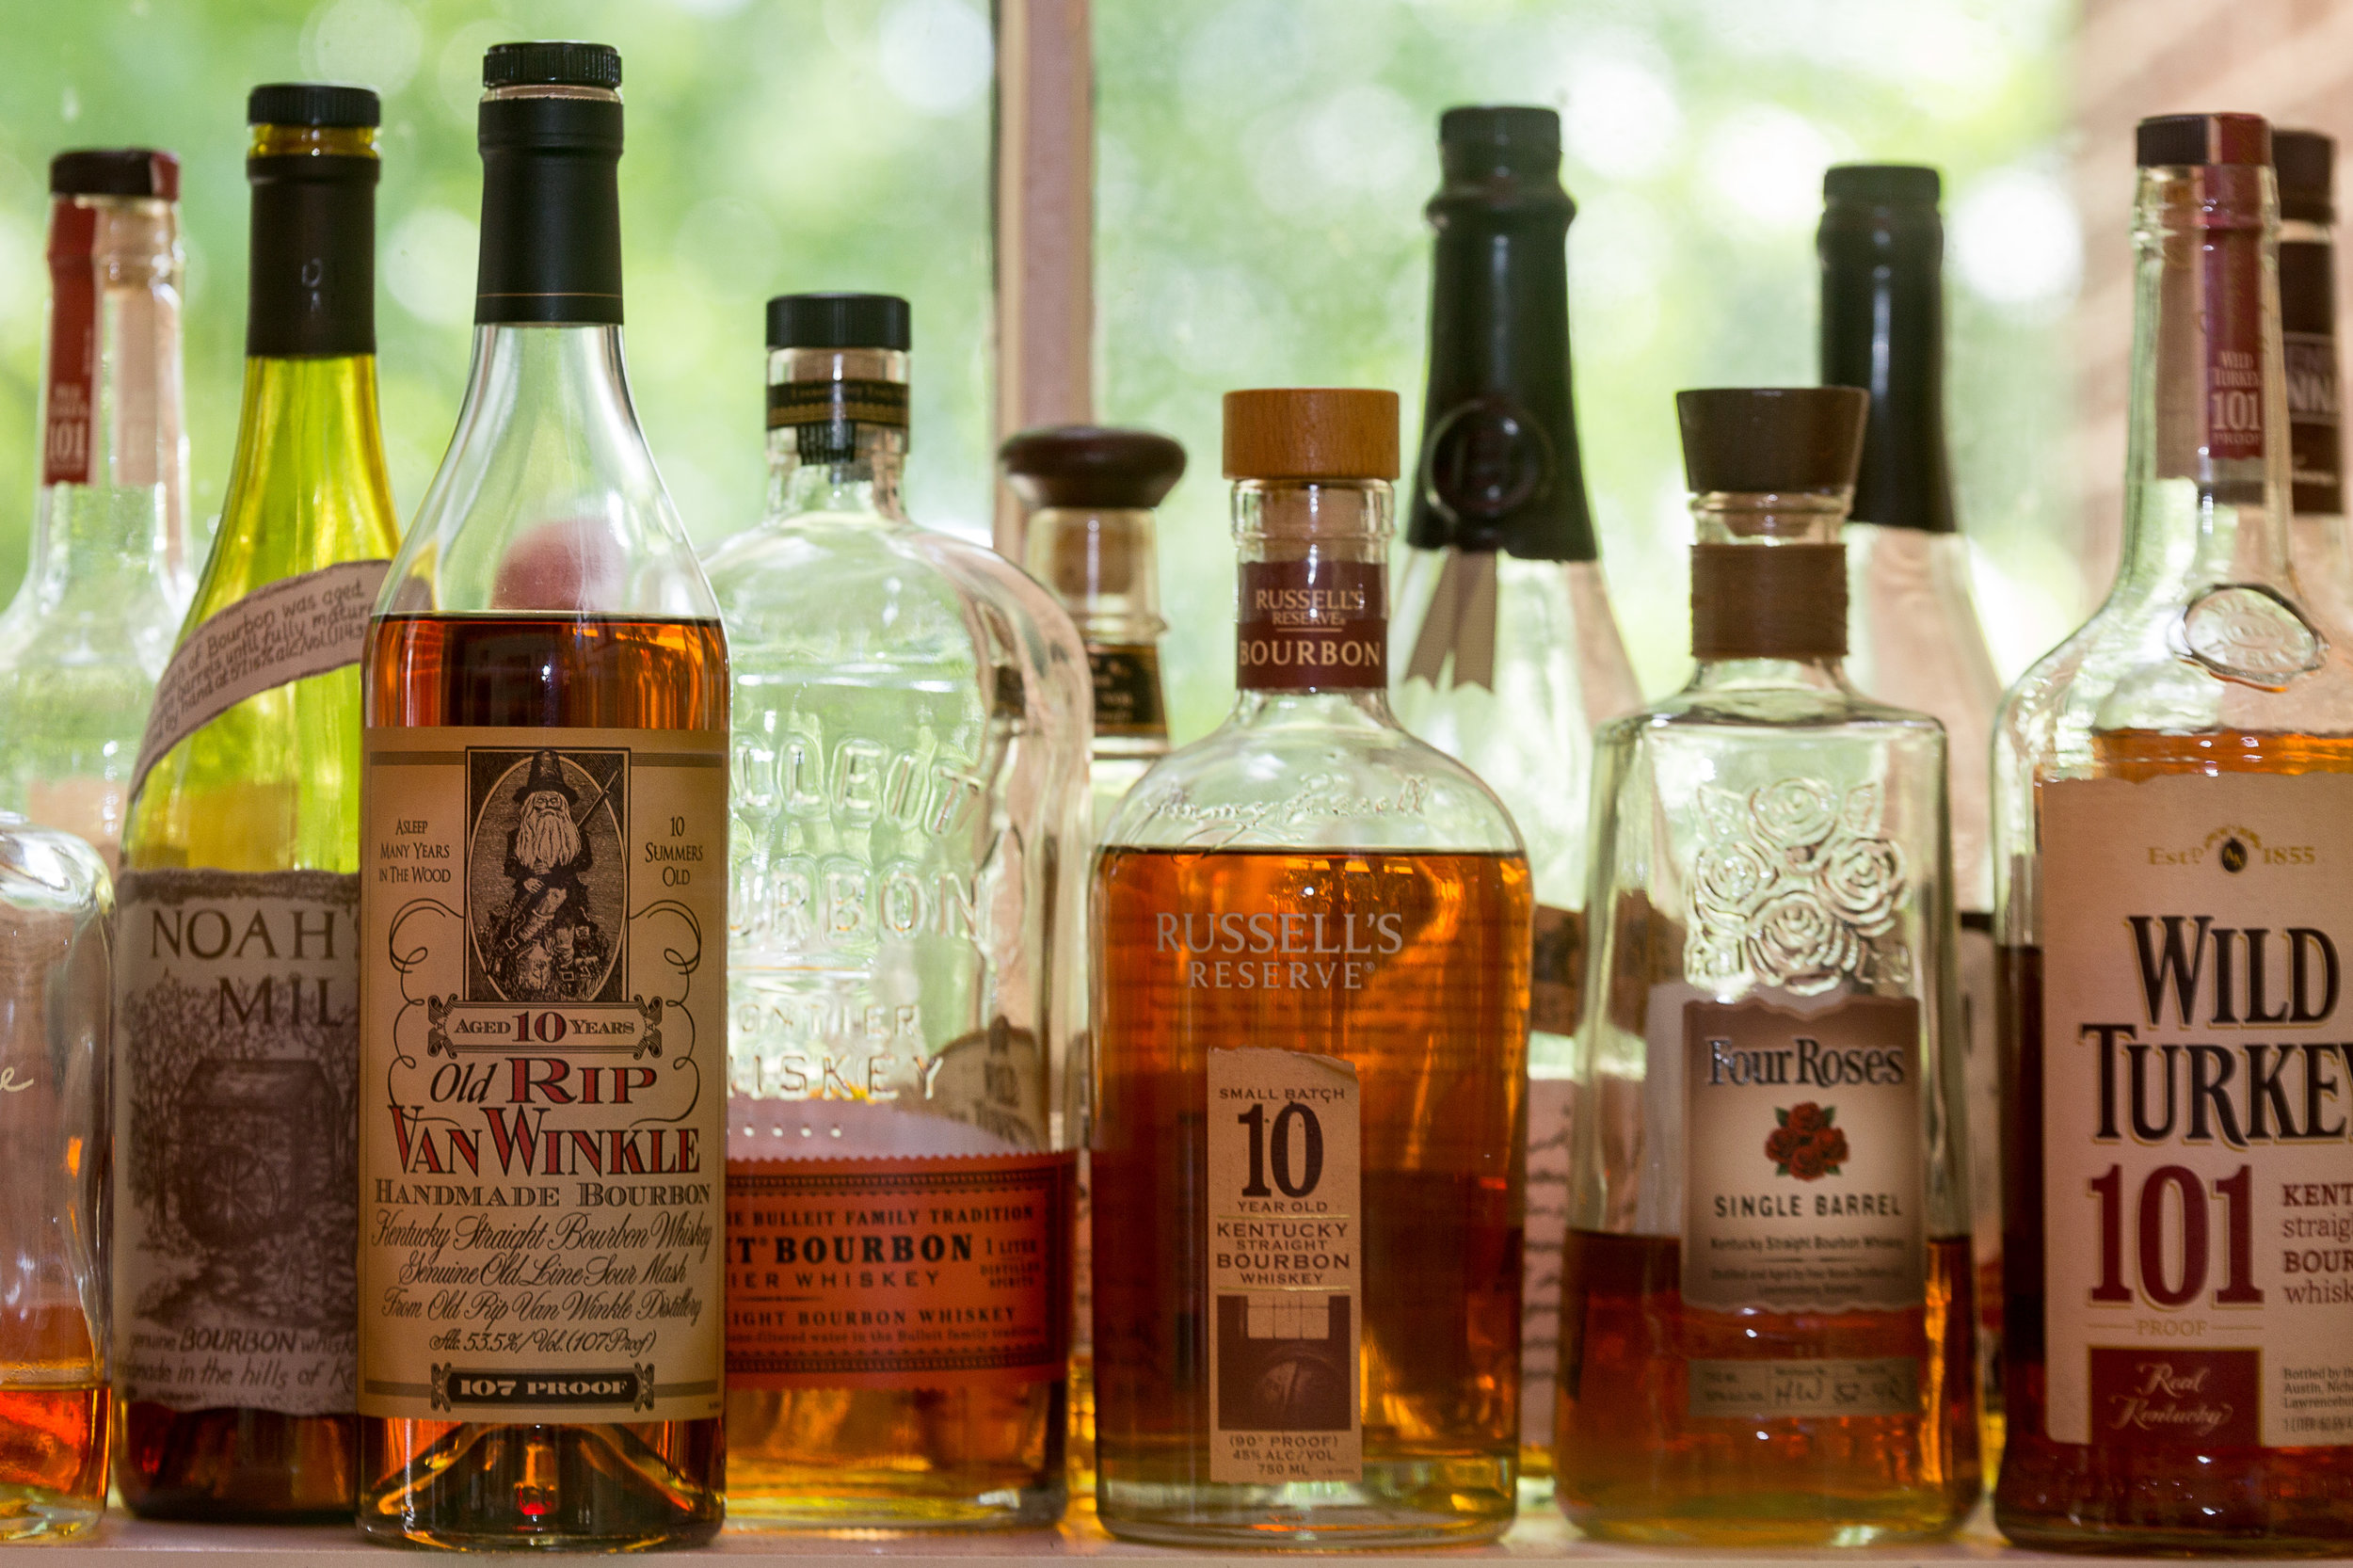 On the Bourbon Trail: Visiting Kentucky's Bourbon Distilleries  — Wonderlust Travel, June 2018